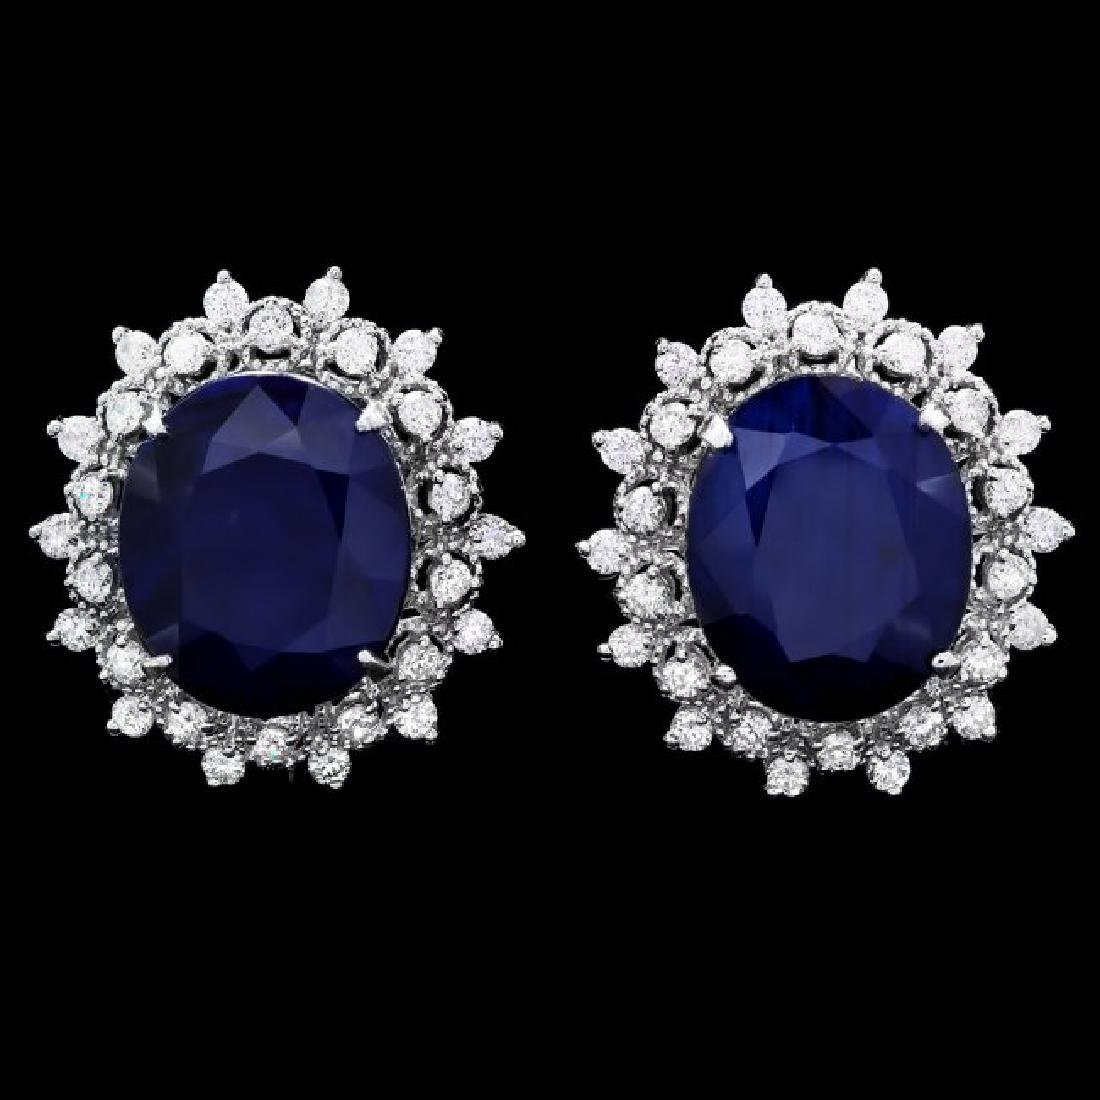 14k Gold 18ct Sapphire 1.35ct Diamond Earrings